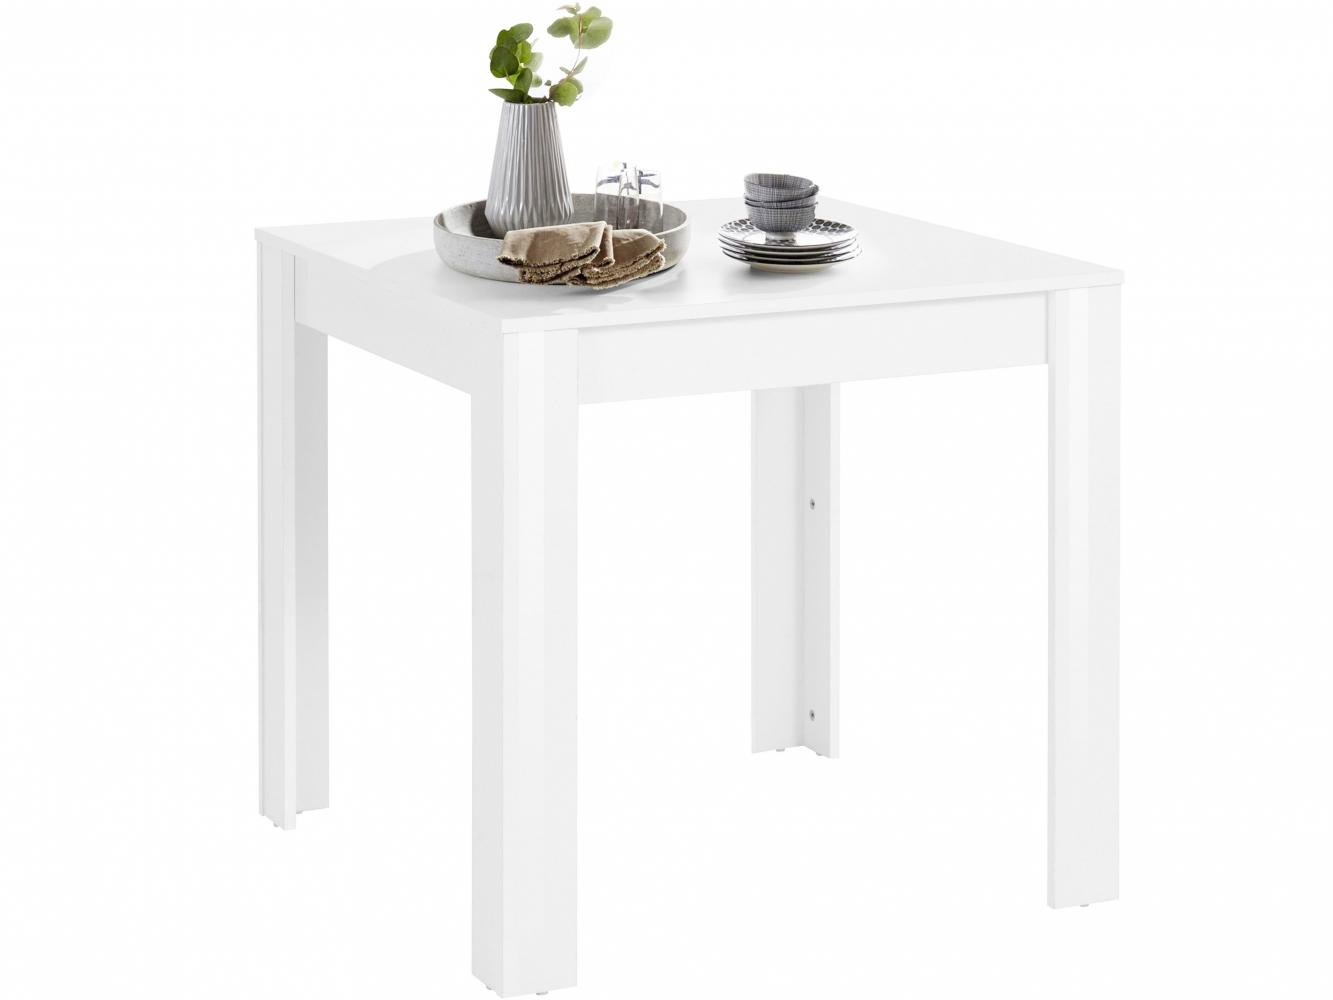 Jídelní stůl Lynet, 80 cm, bílá